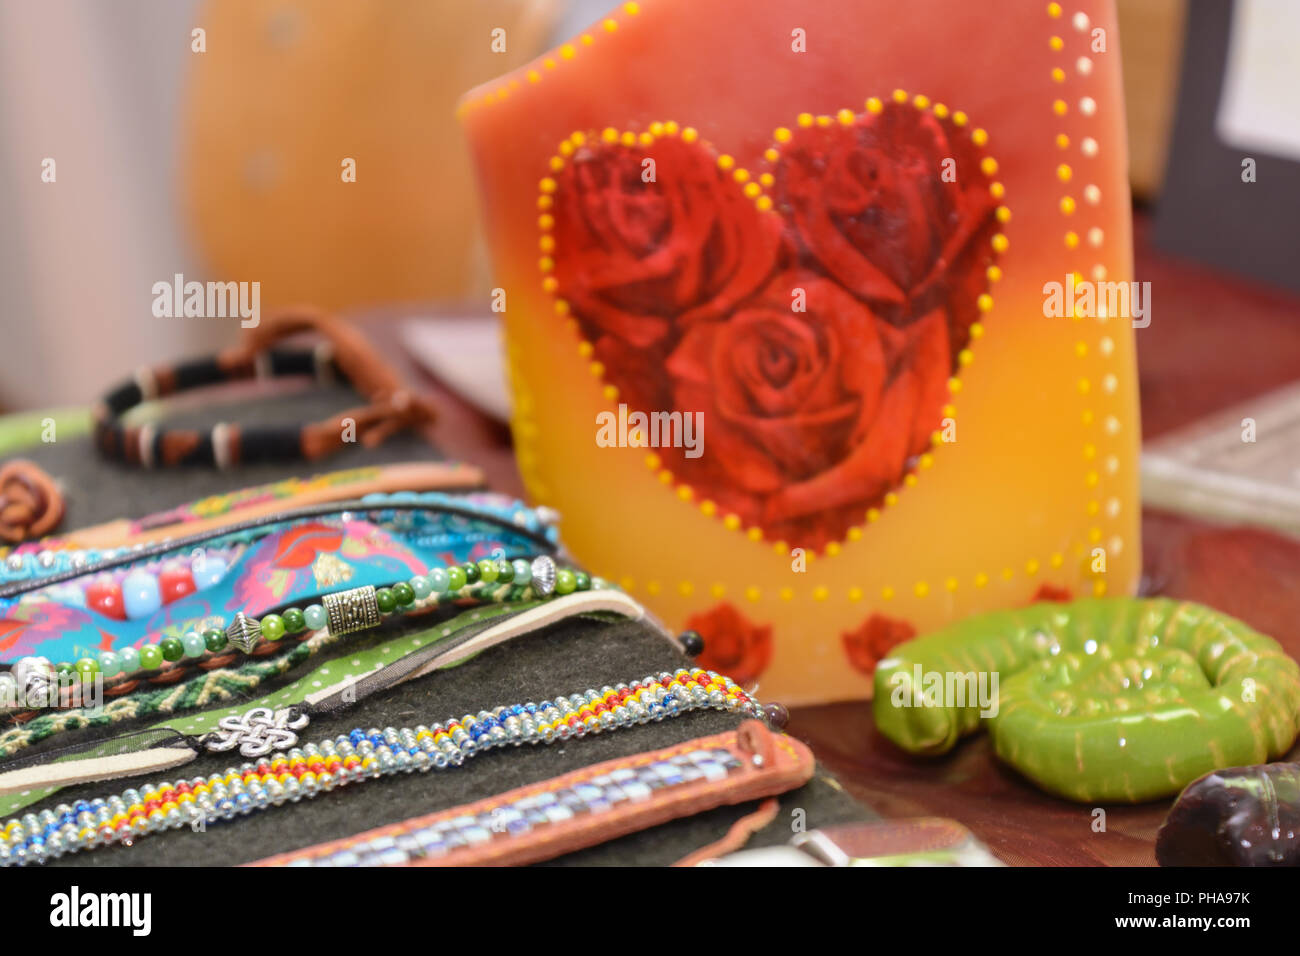 Colorful jewelery - fashion accessory close-up - Stock Image